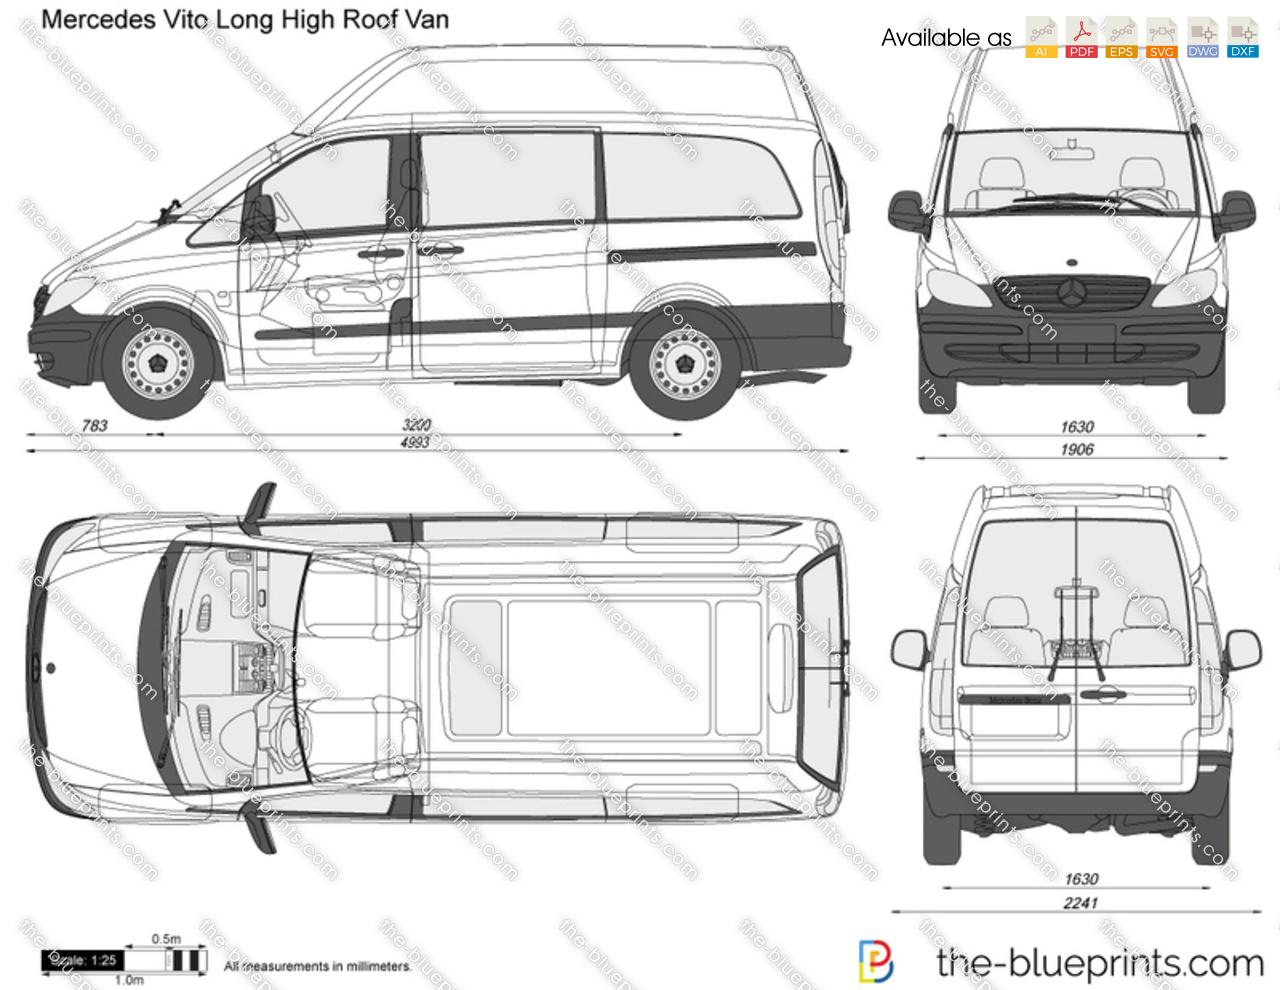 Mercedes-Benz Vito Long High Roof Van vector drawing